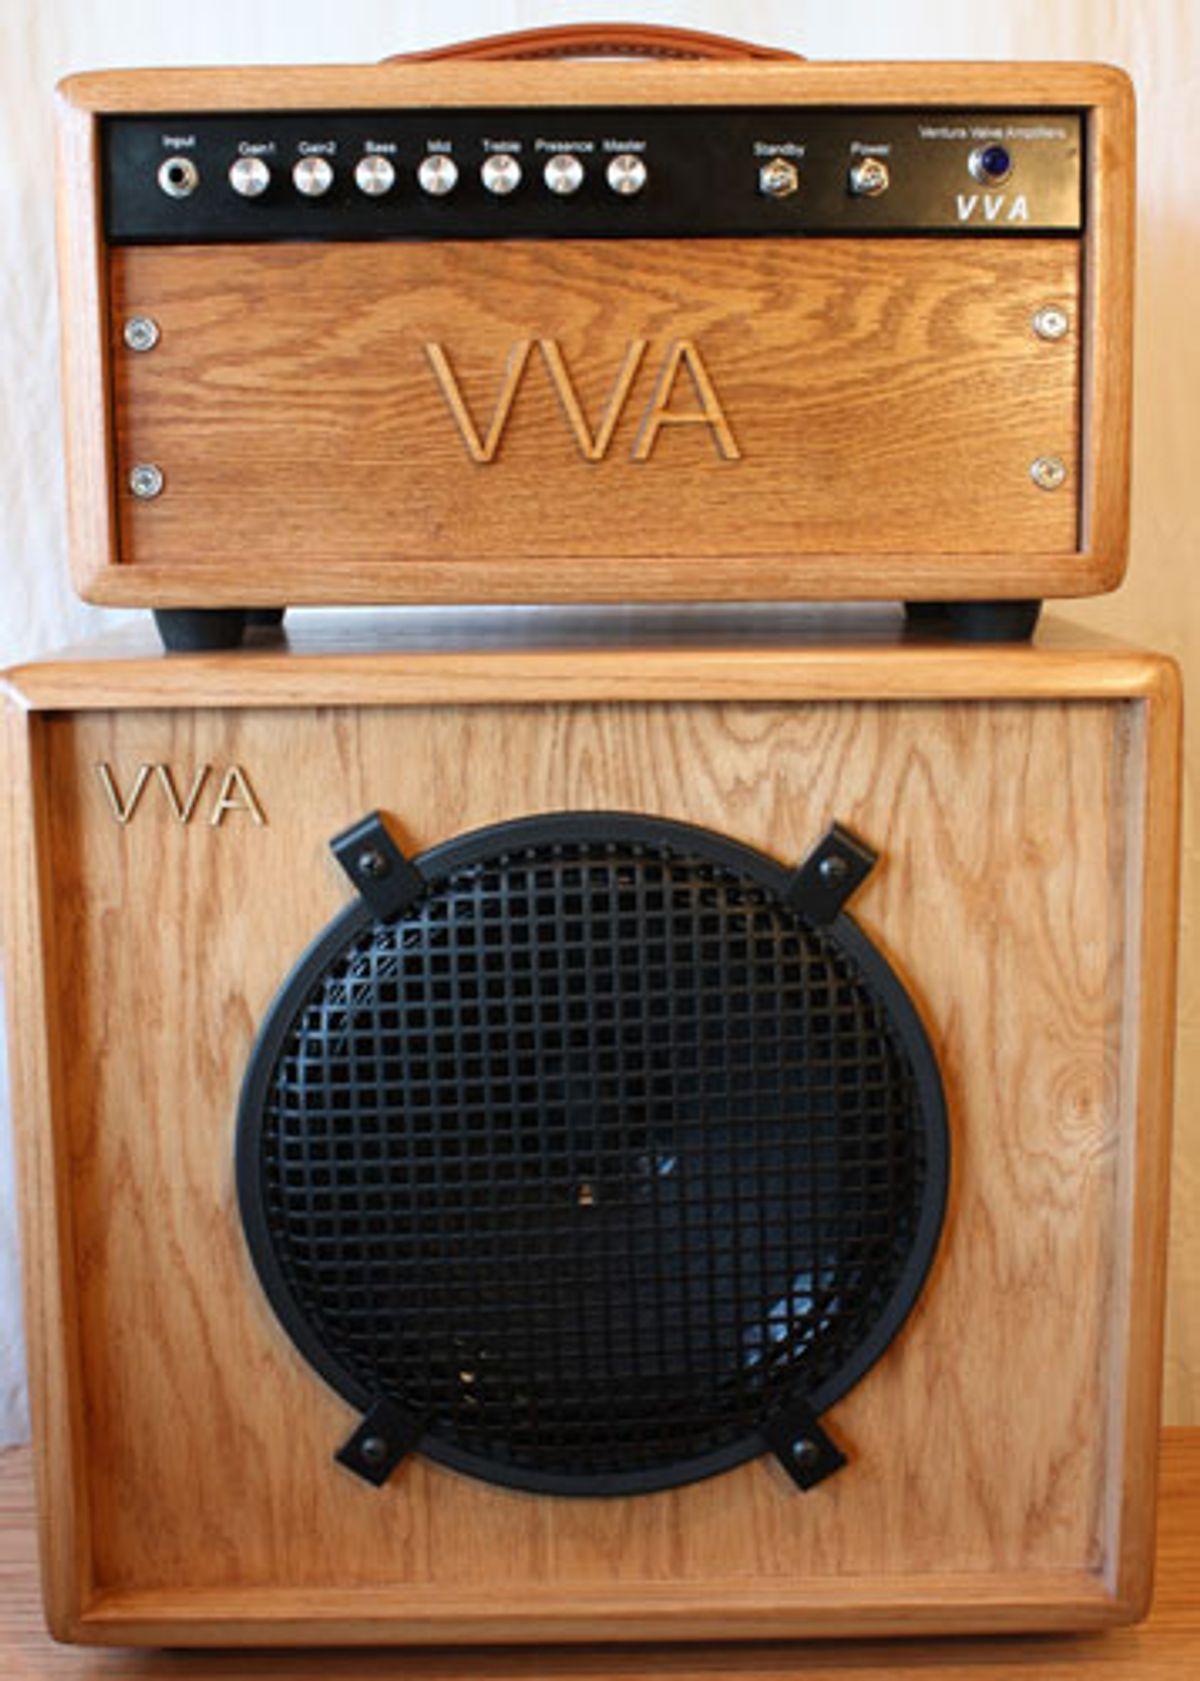 Ventura Valve Amplifiers Announces the VVA50 Head and VVA Speaker Cabinets